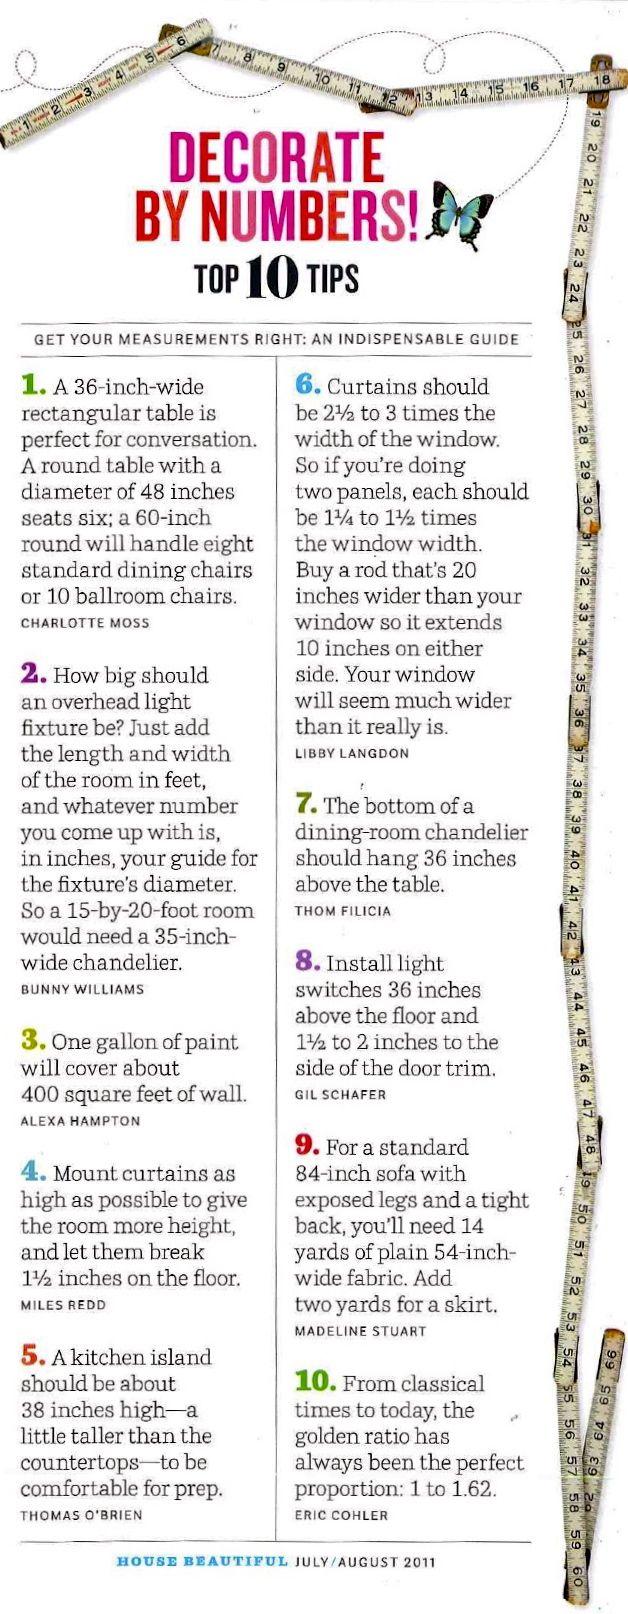 House Beautiful Tips